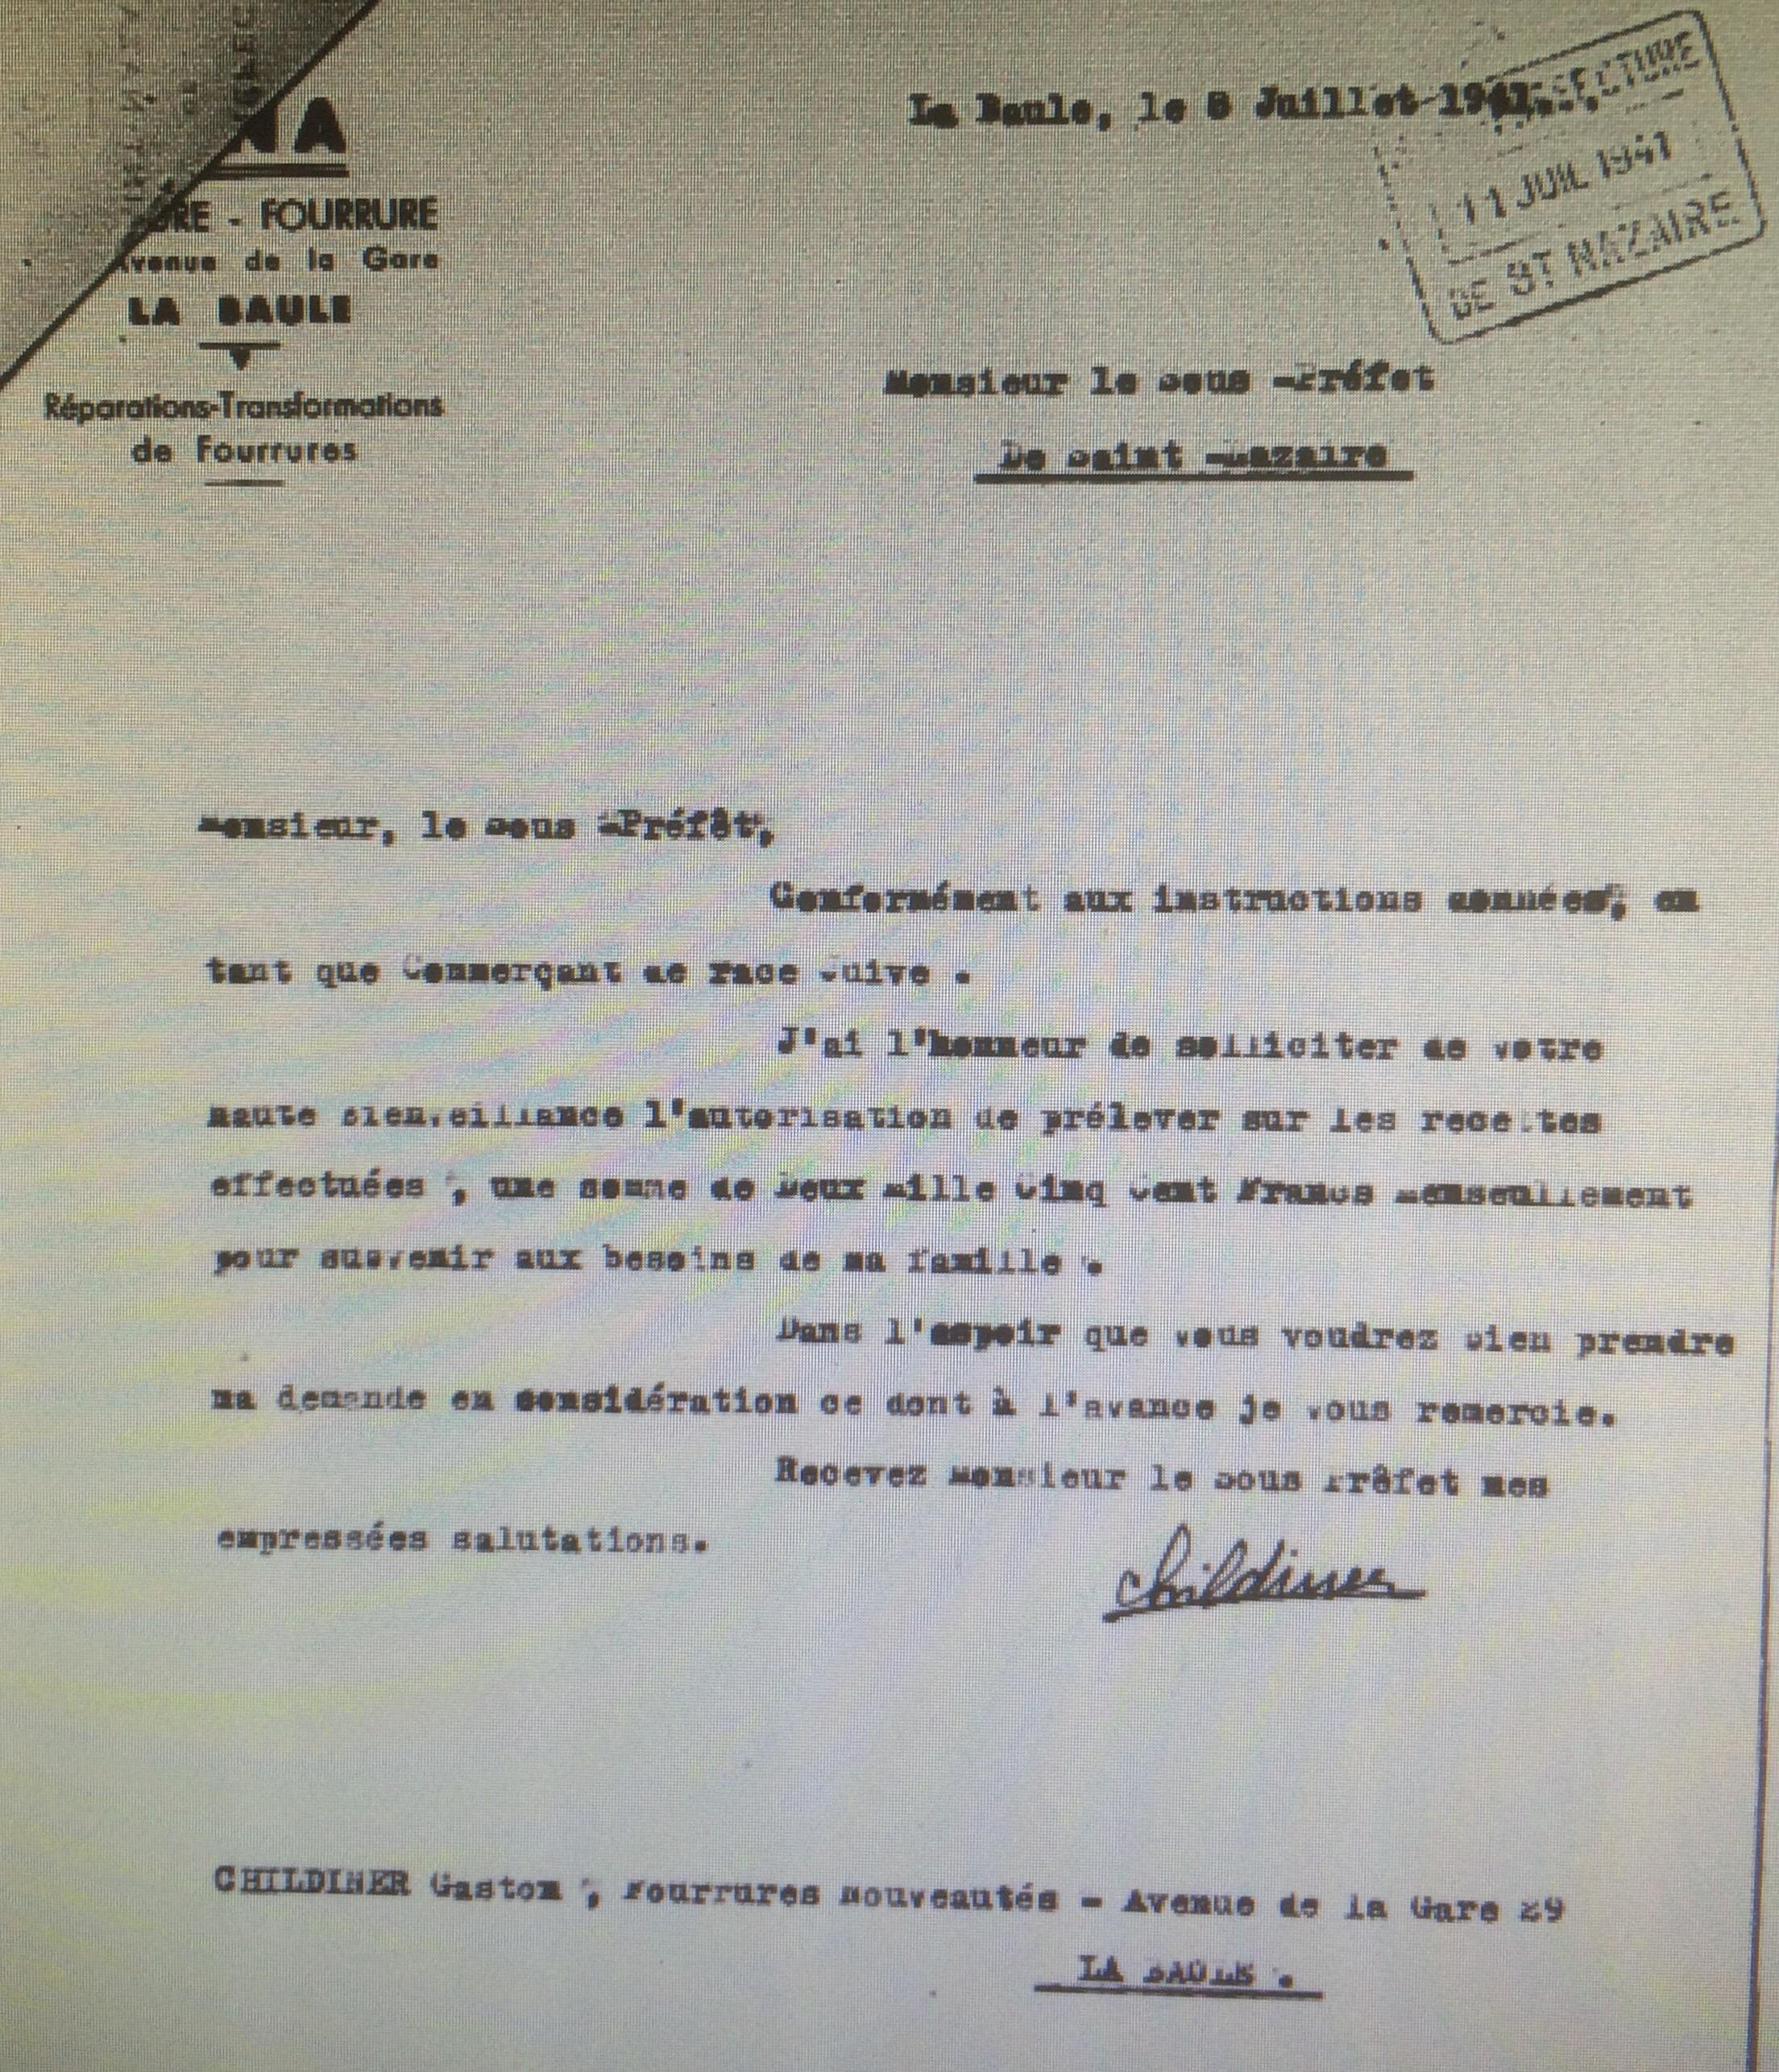 Dossier d'aryanisation CHILDINER Gaston [AN AJ38/4598 dossier n°2719]